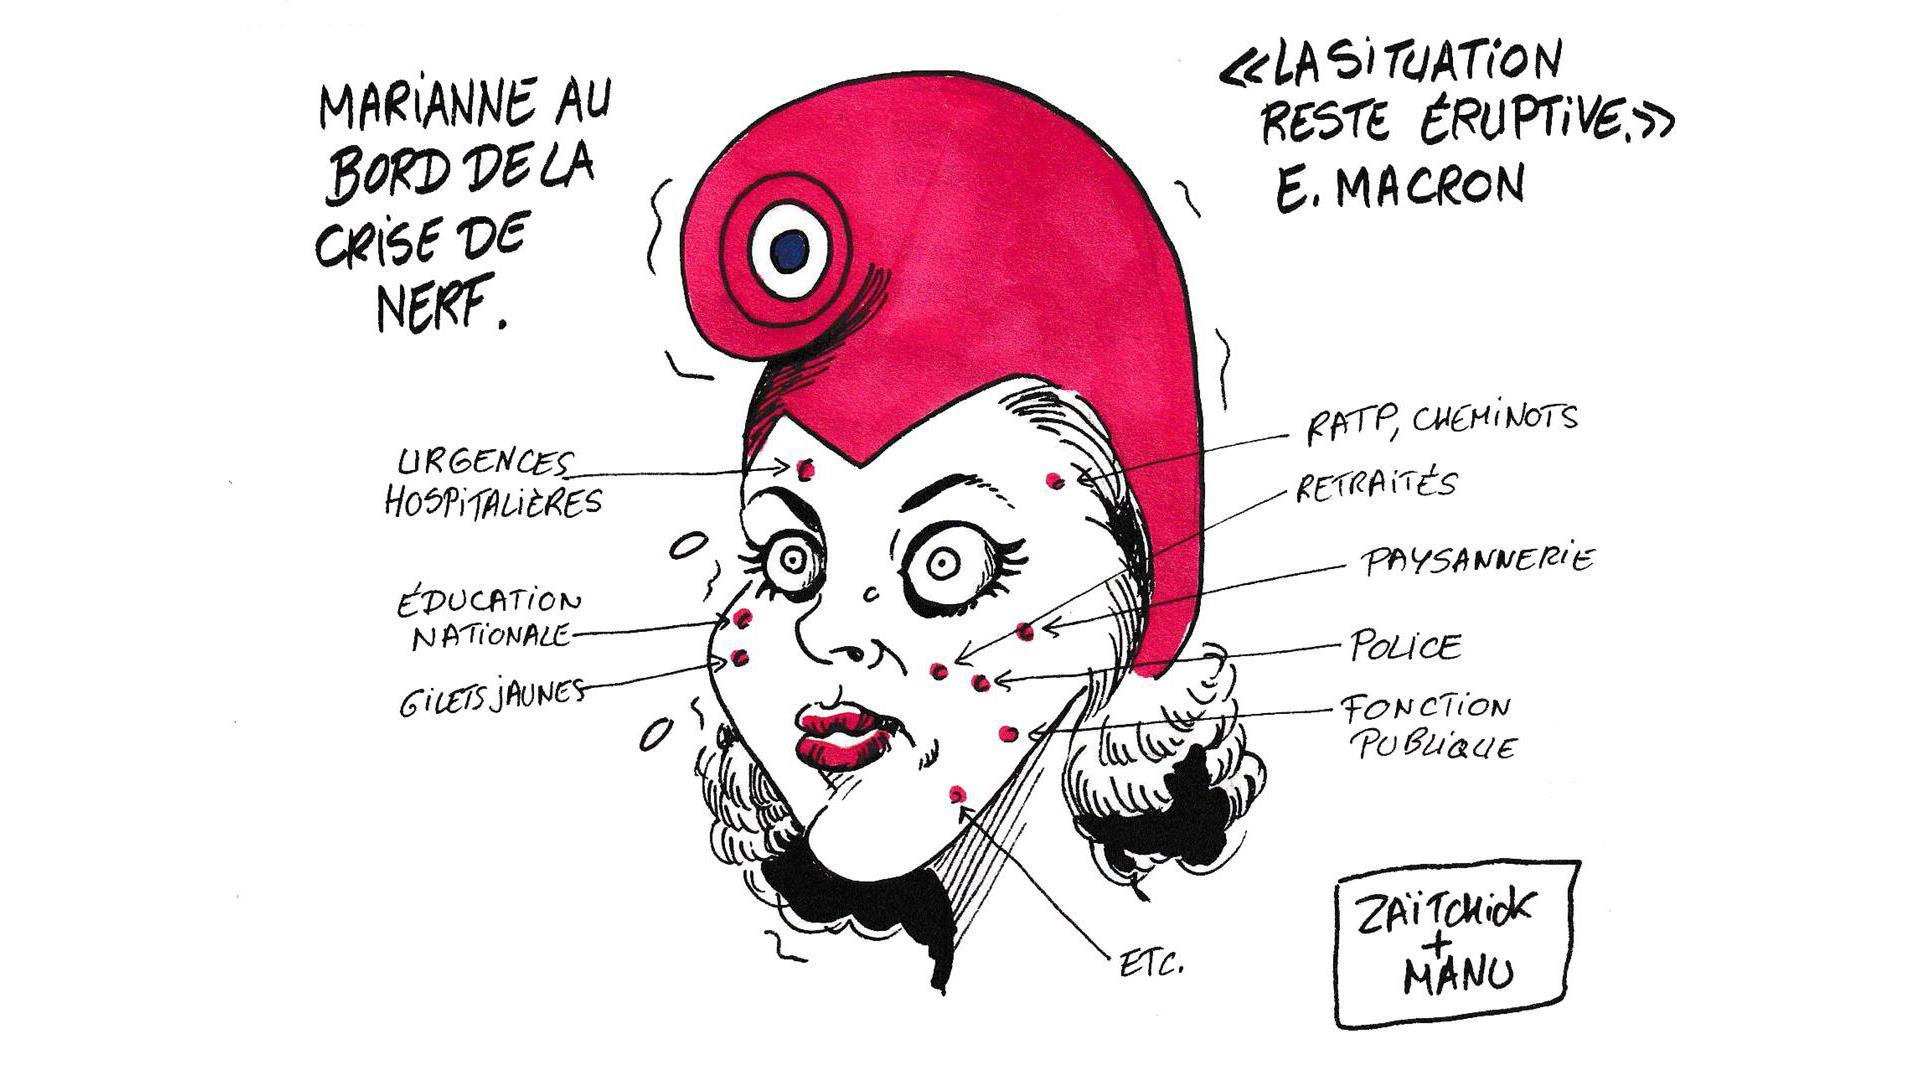 Marianne-éruptive-Large-Large